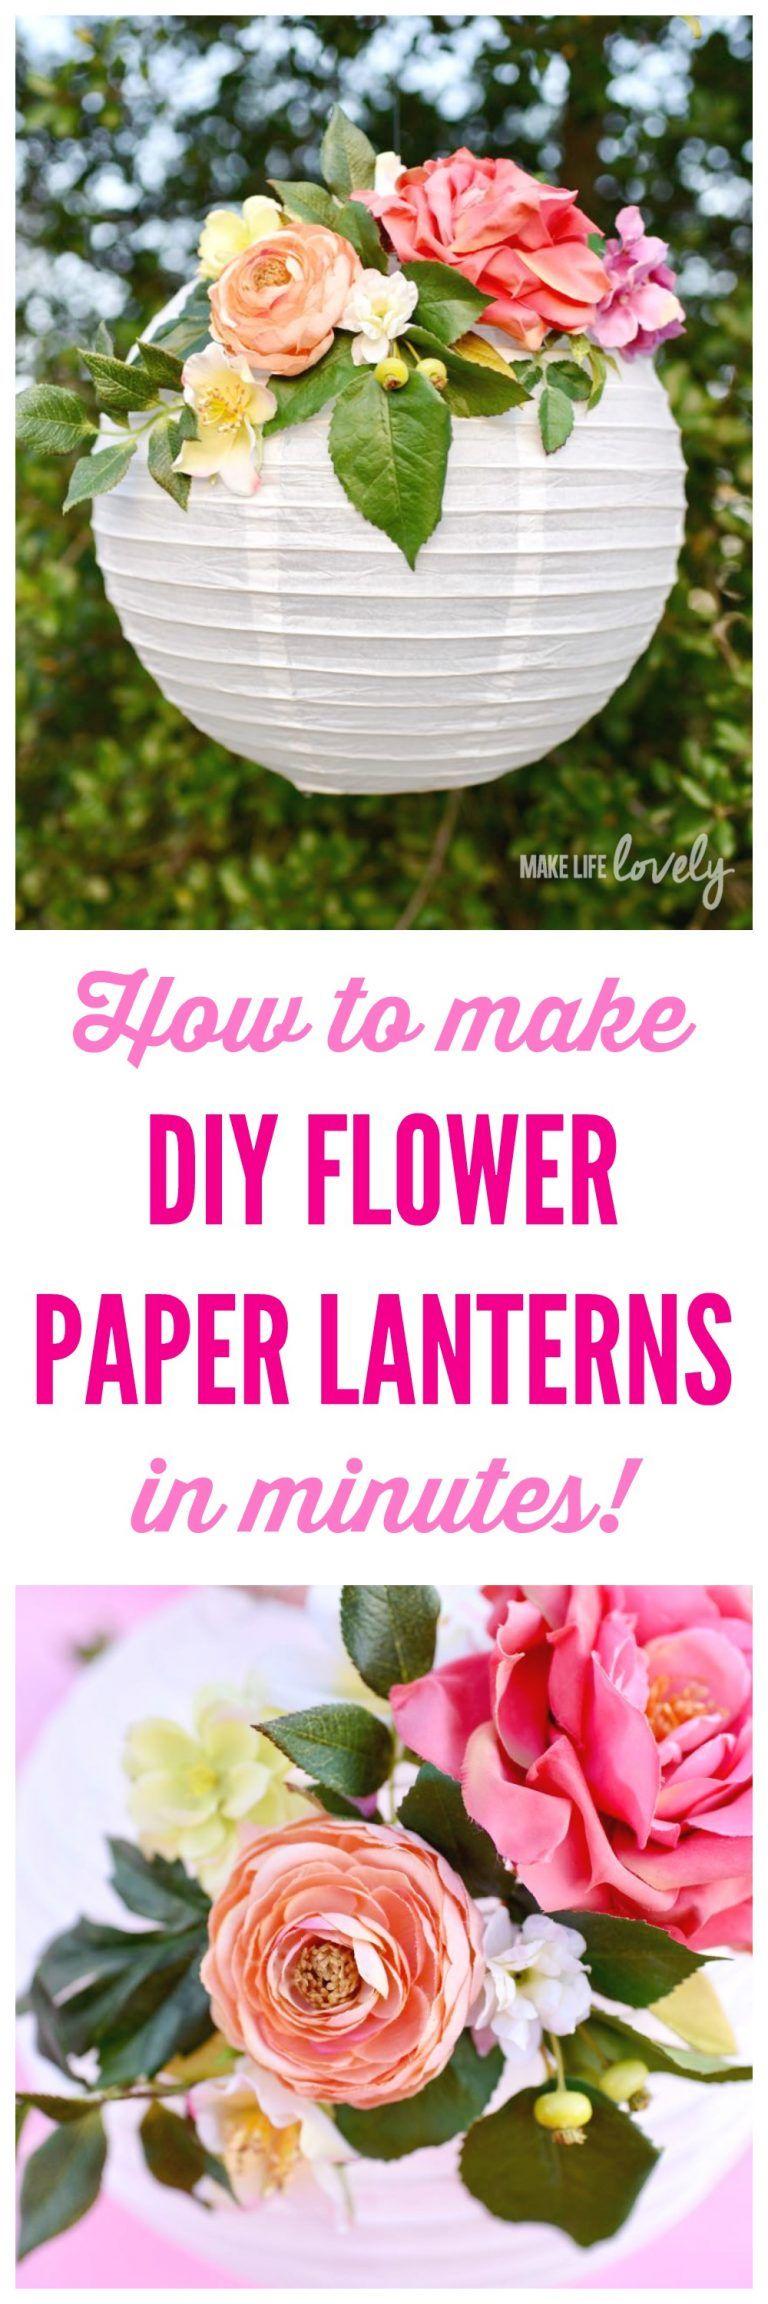 DIY Flower Paper Lanterns Tutorial | Flower paper, Diy flower and ...